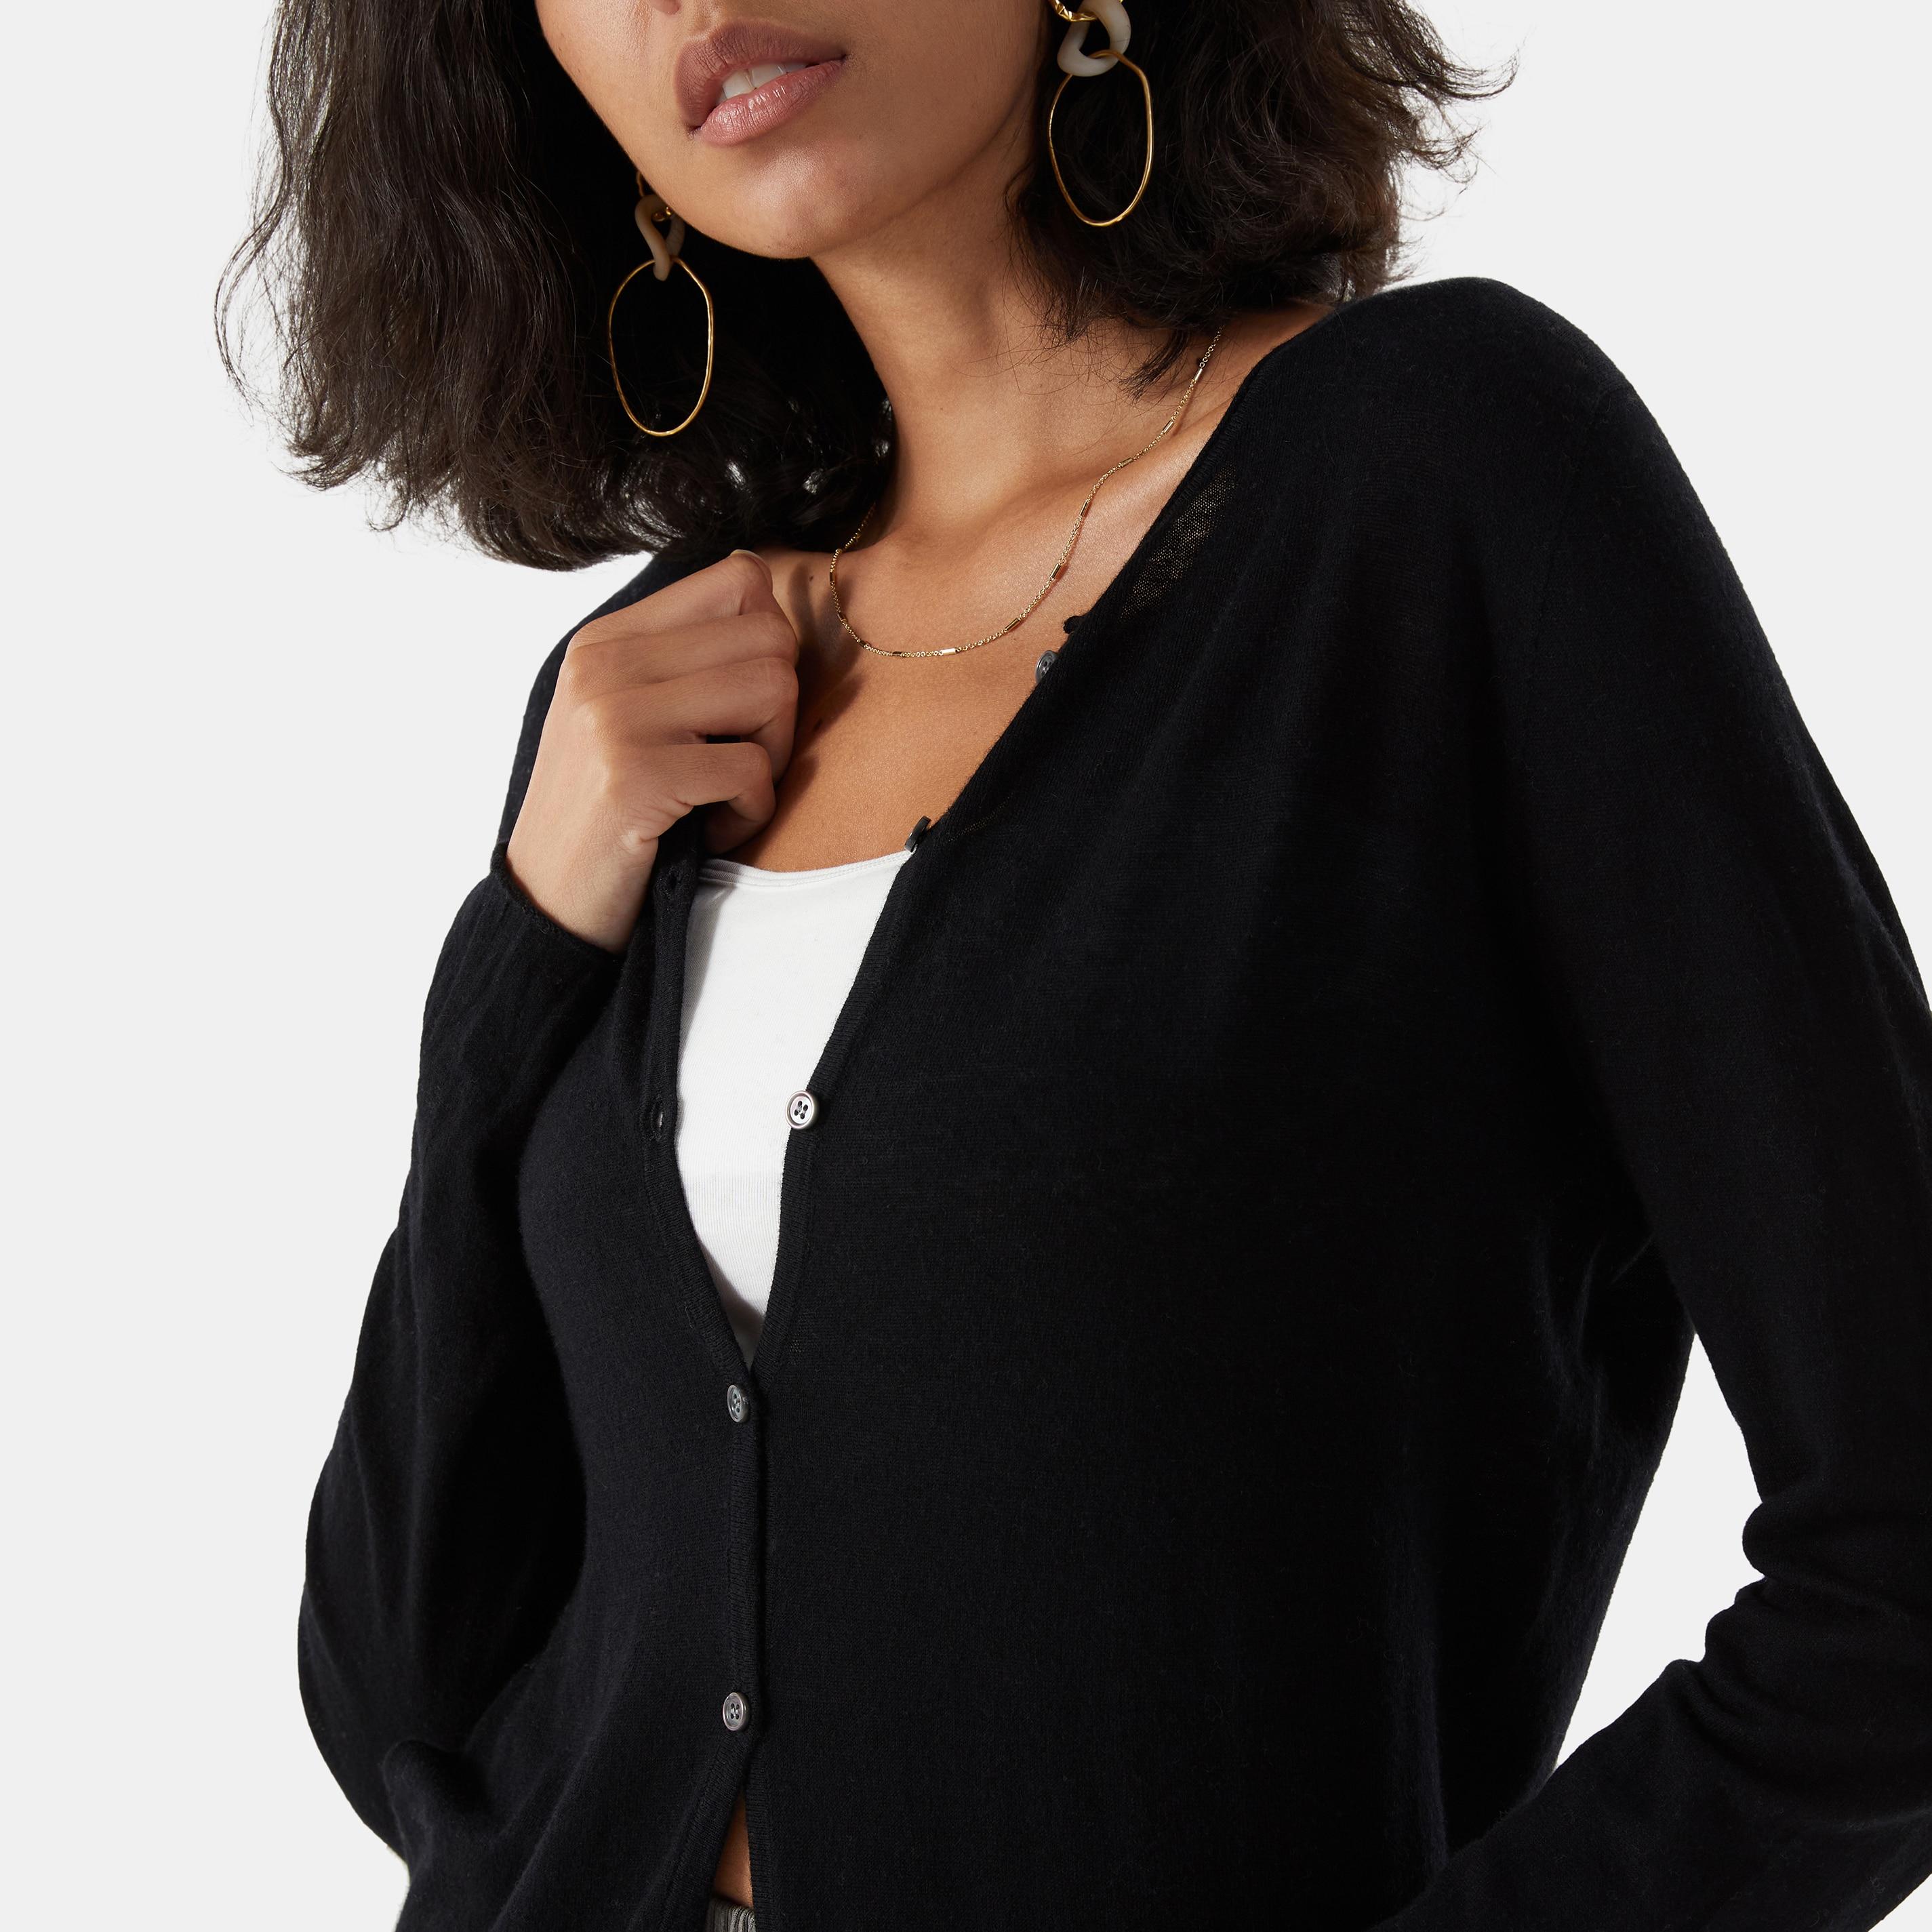 Cashmere Cardigan-Solid Black - Solid Black S